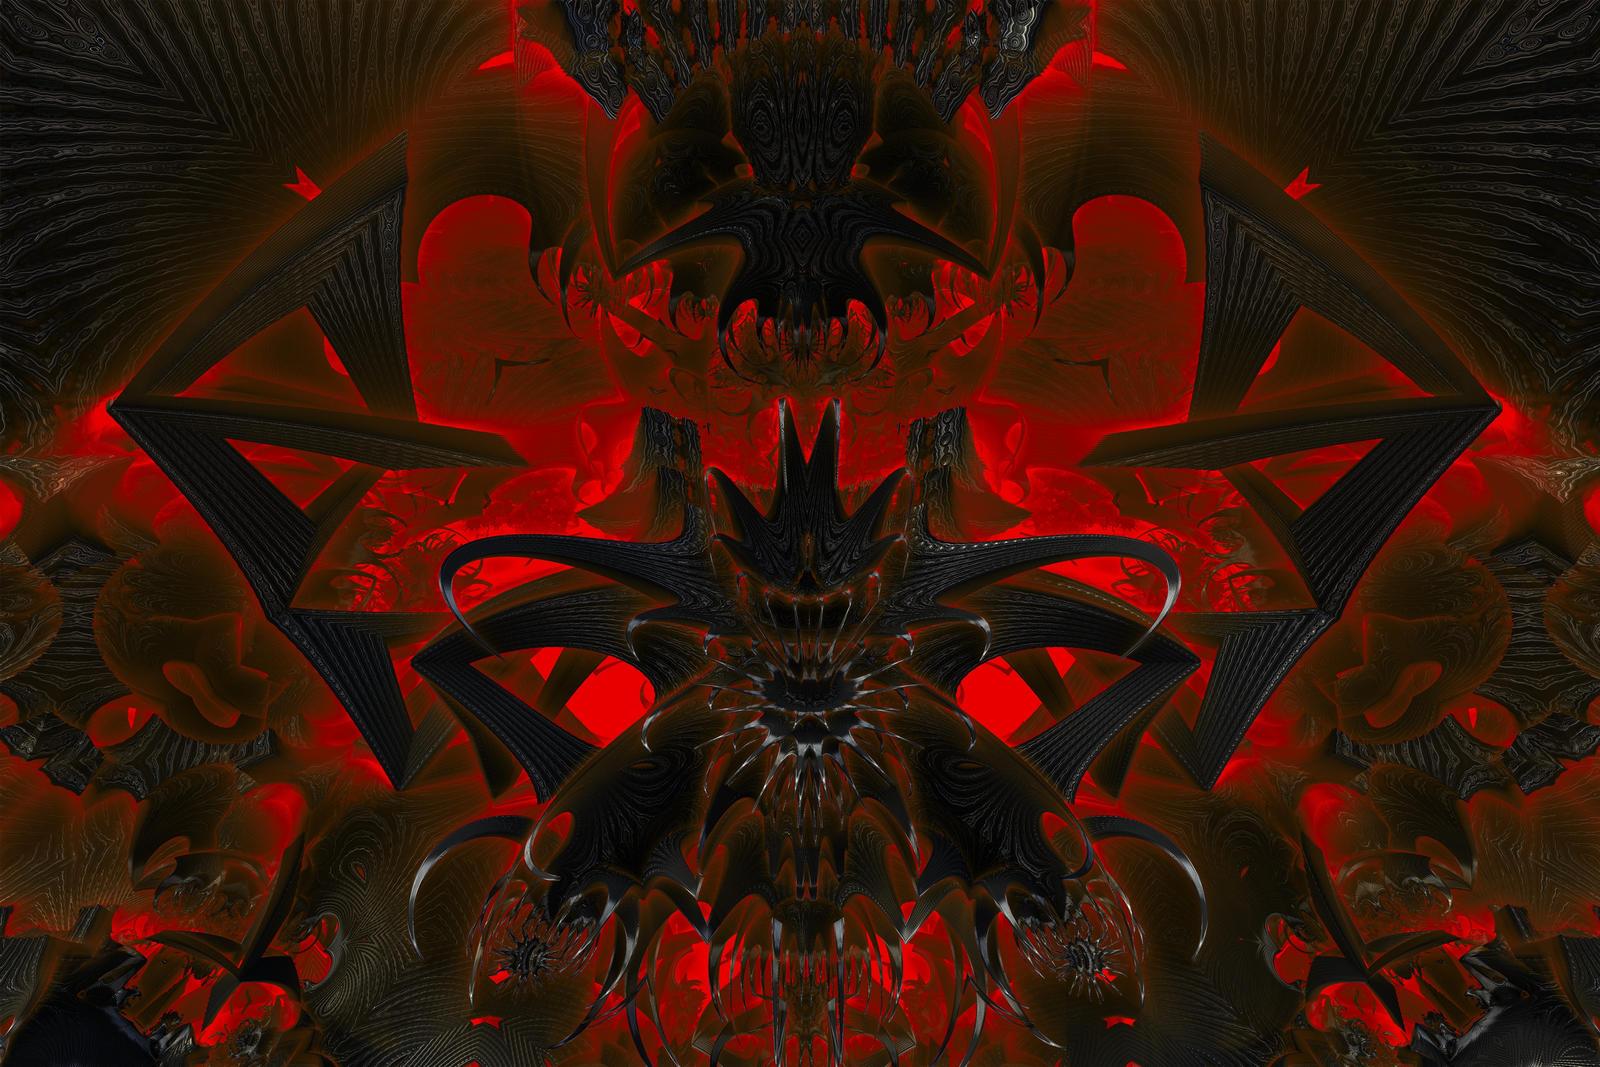 Hellfire by GrahamSym